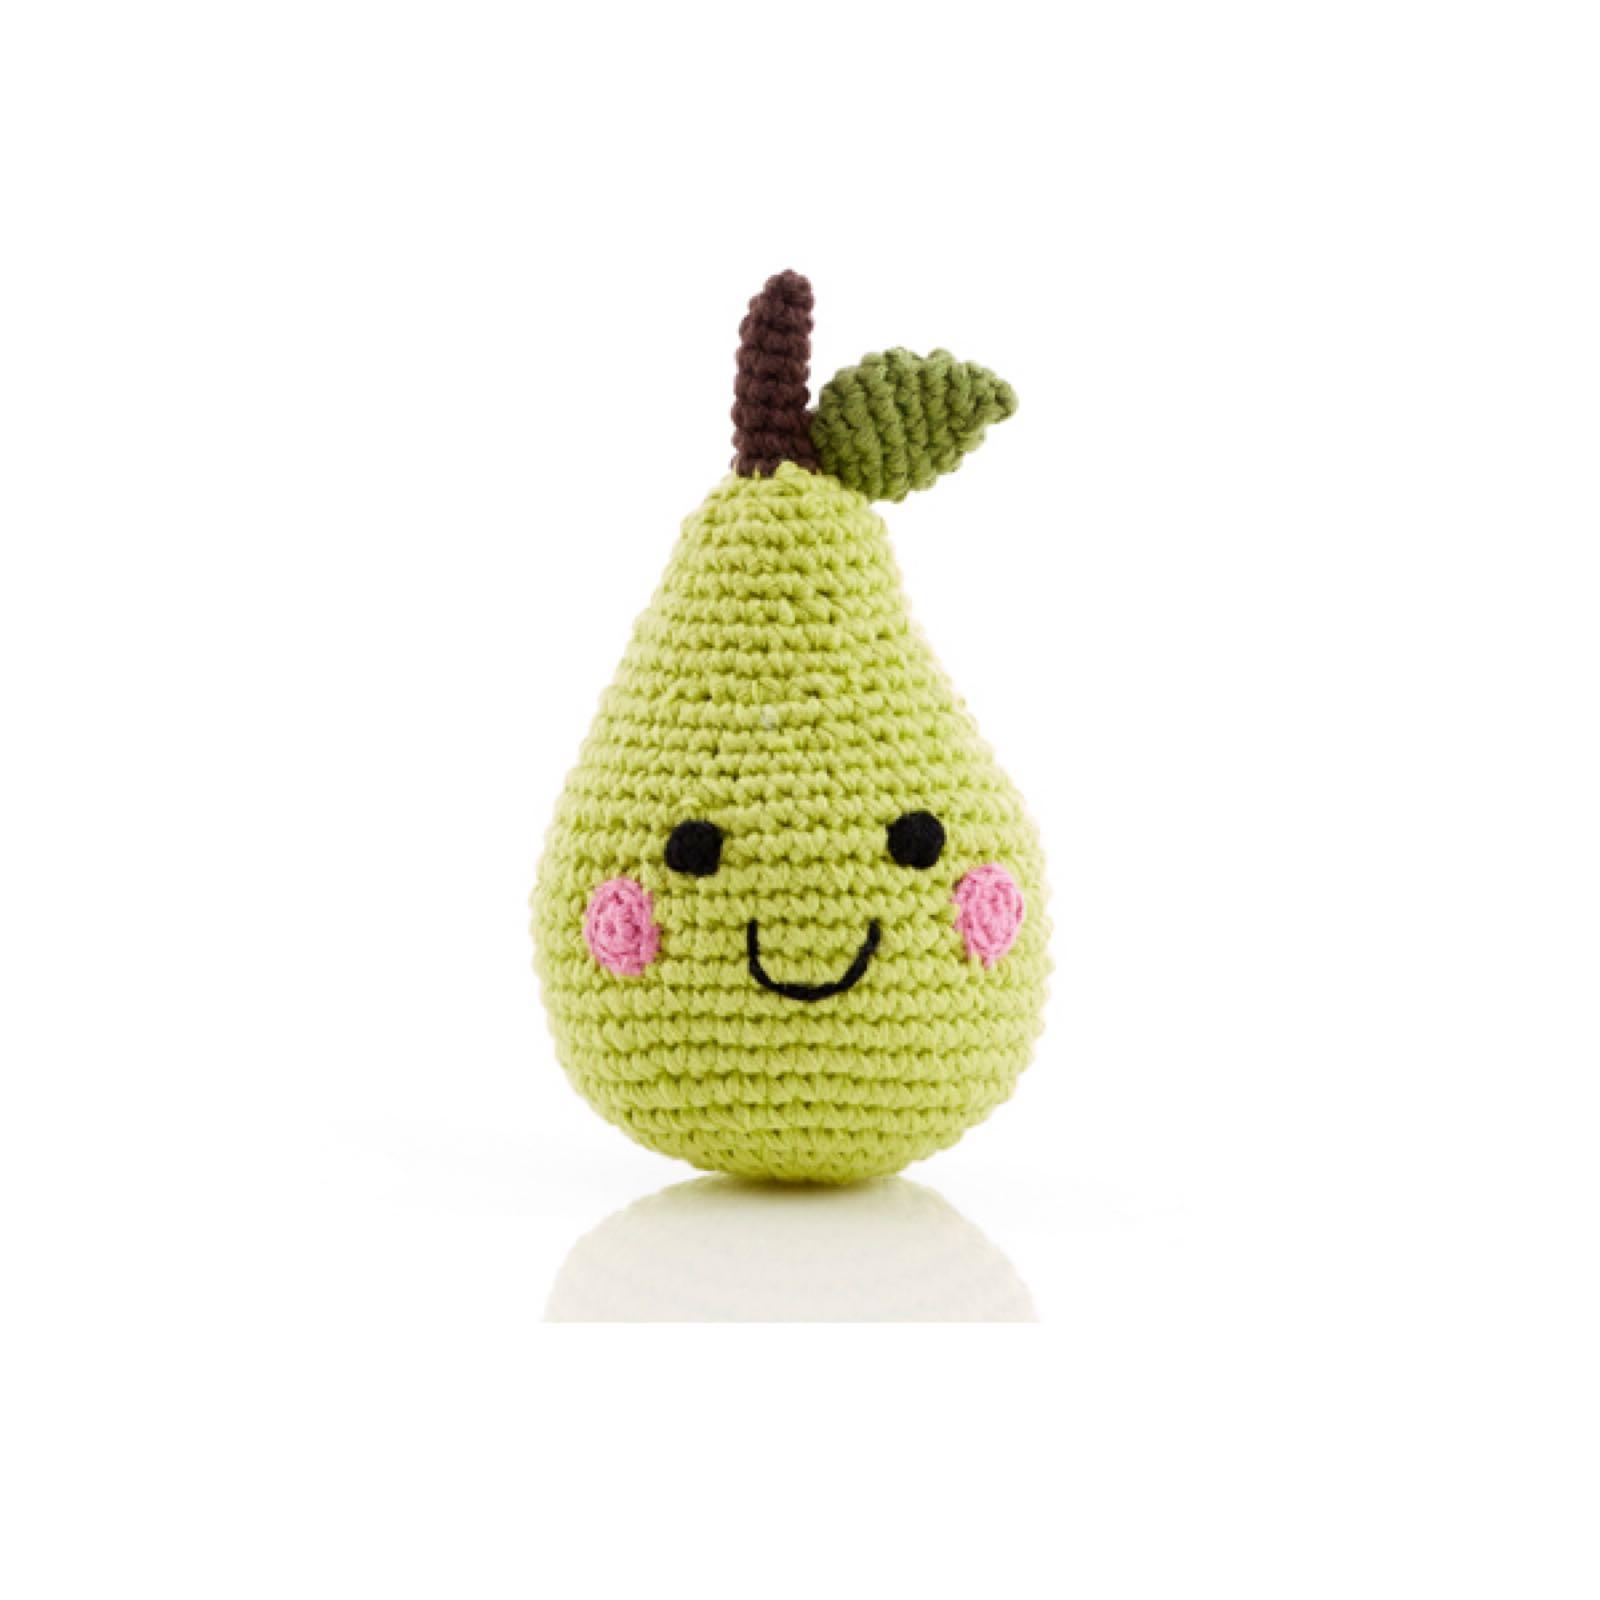 Pebble - Crochet Pear Rattle